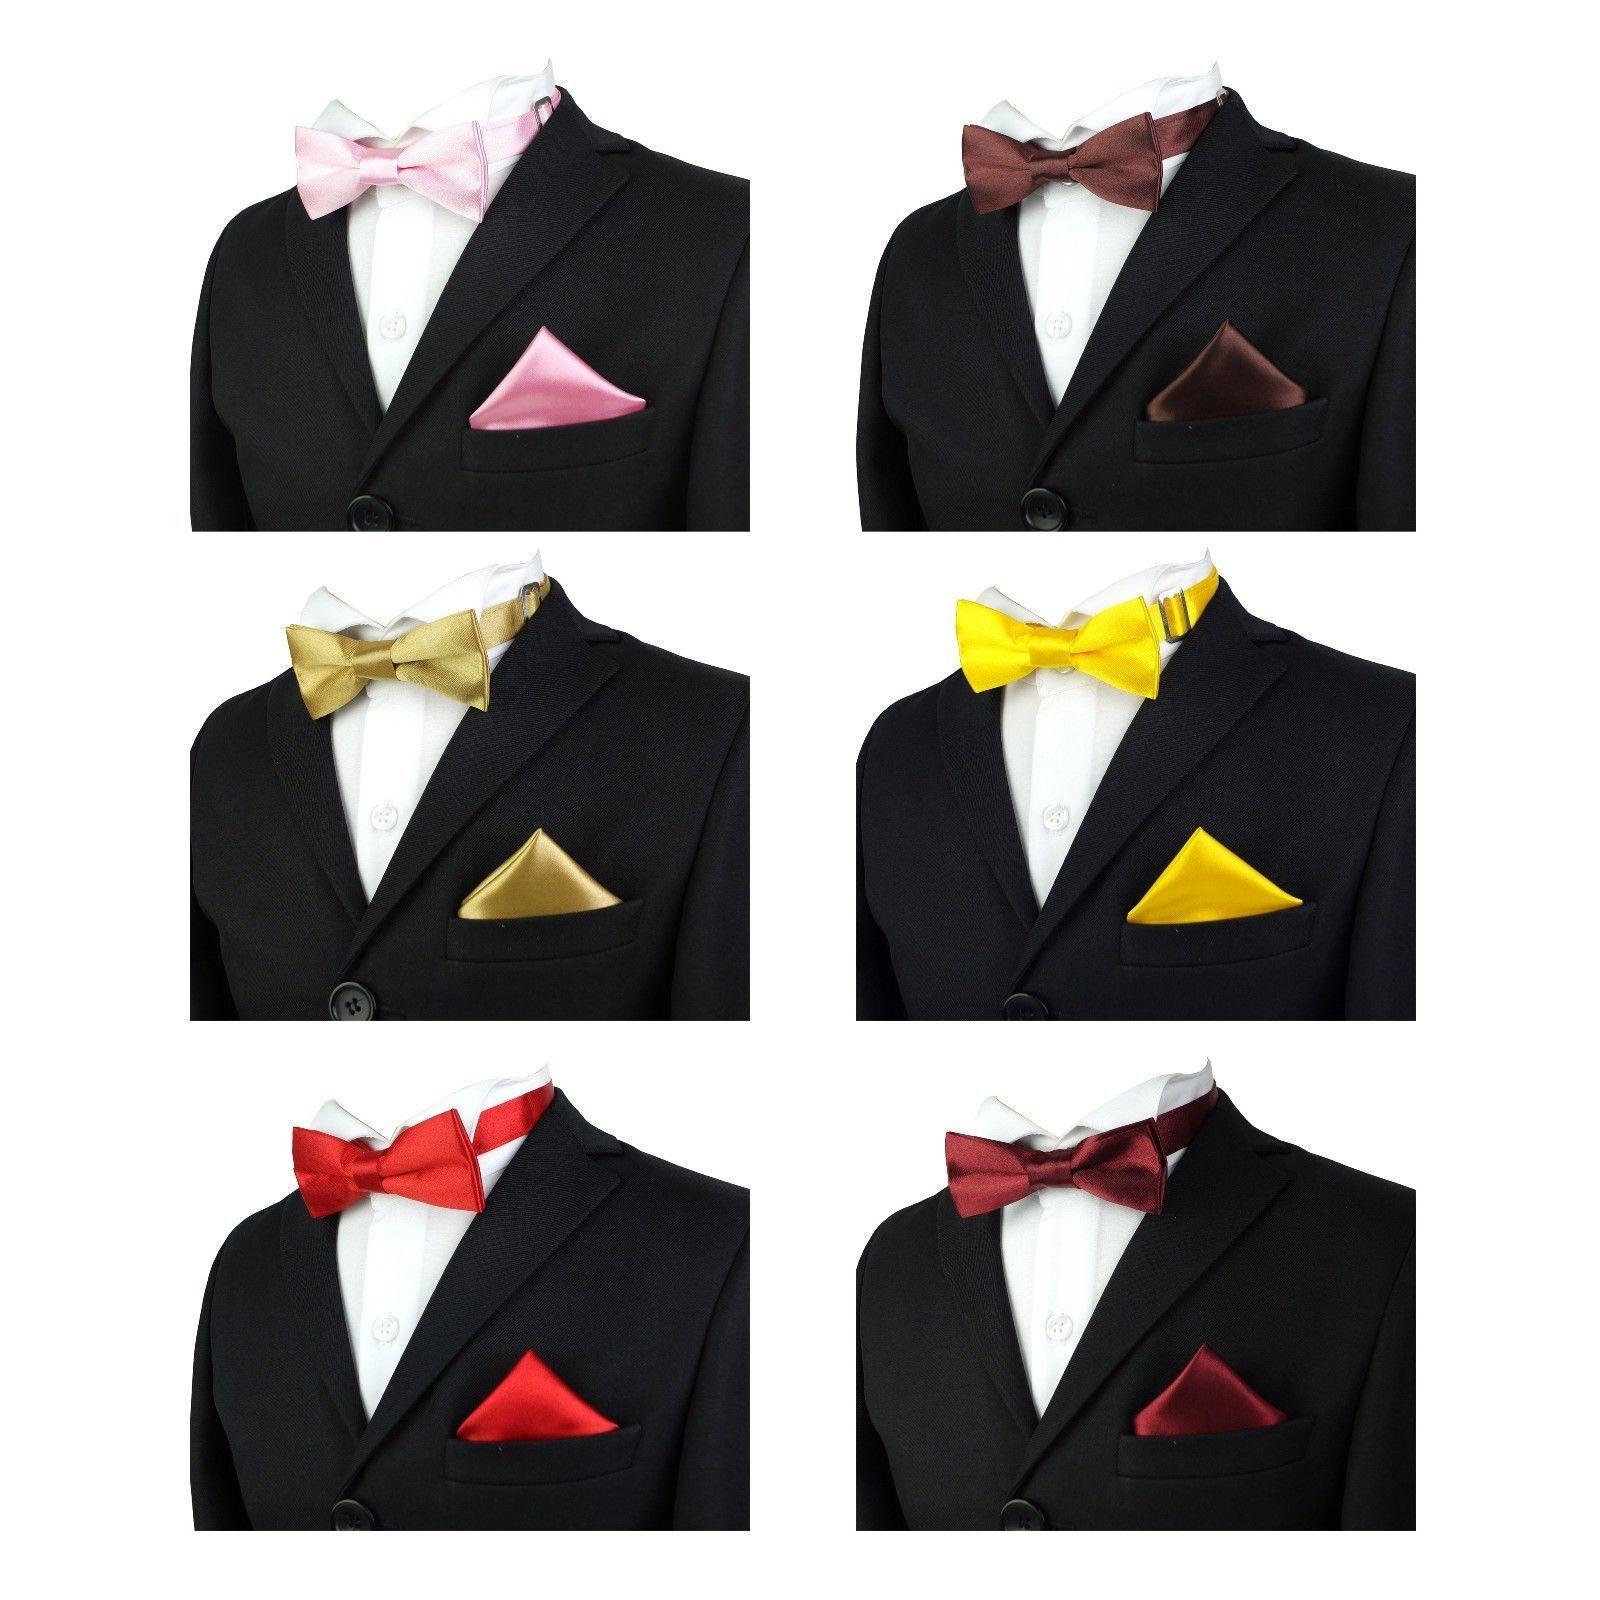 fa7fc56c51c1 Details about Boys Satin Plain Bow Tie Set Kids Pre-tied Adjustable Bow Ties  Pocket Square